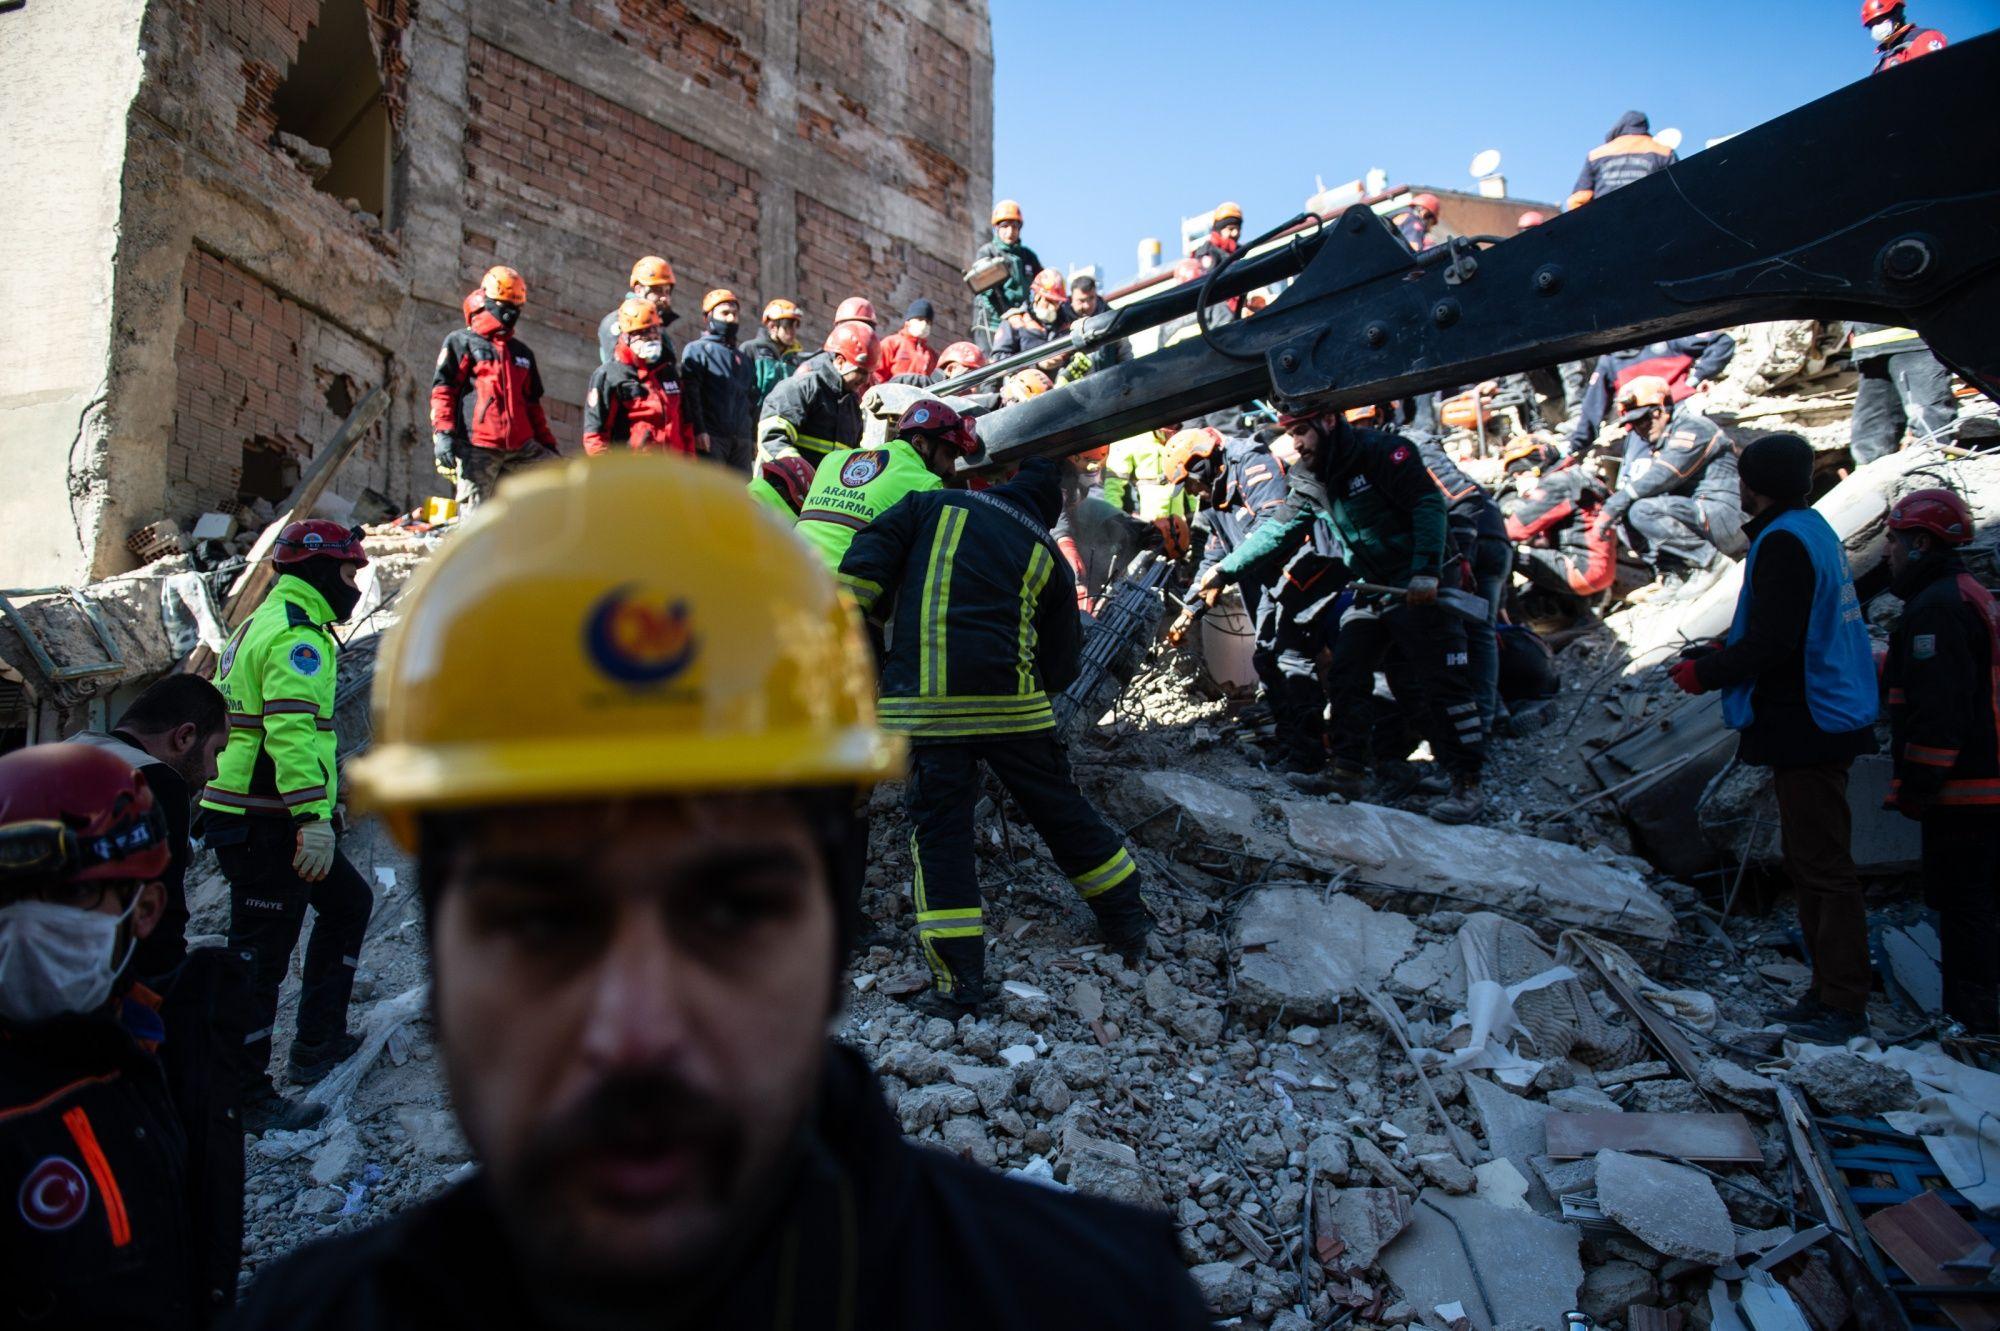 Death Toll Rises in Turkey Quake as Erdogan Slams Social Media